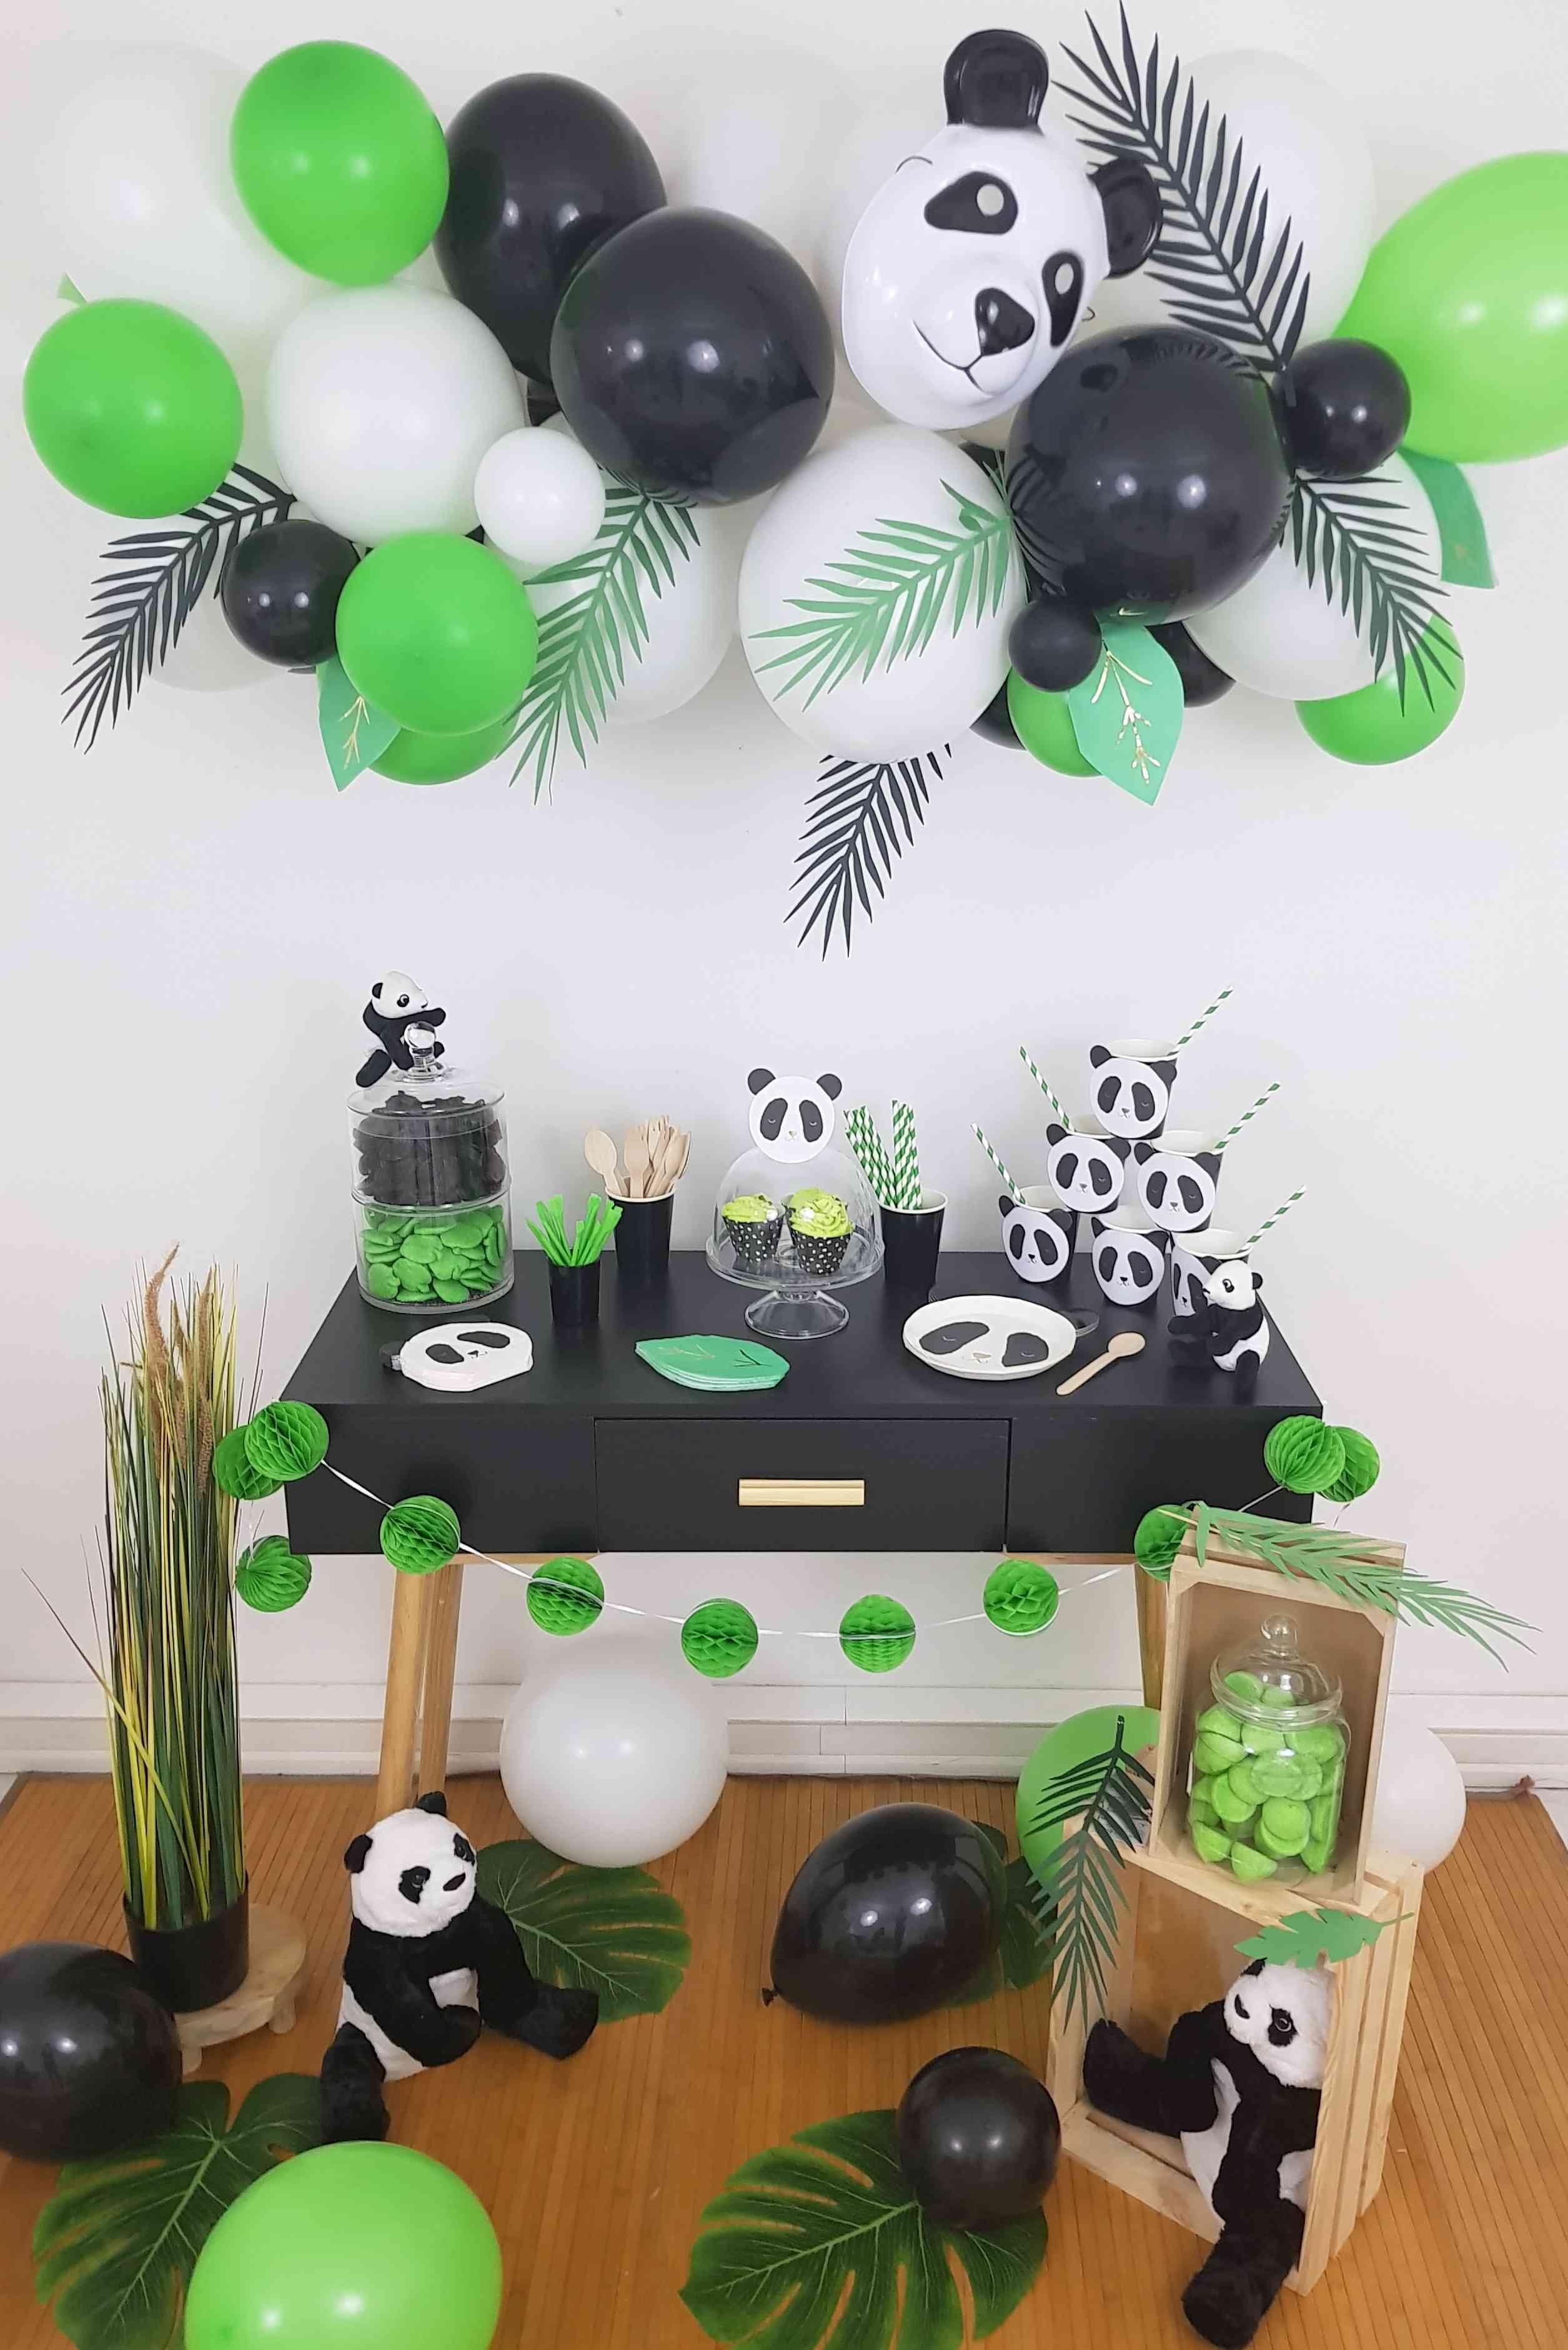 Decorations Anniversaire Sweet Table Theme Panda